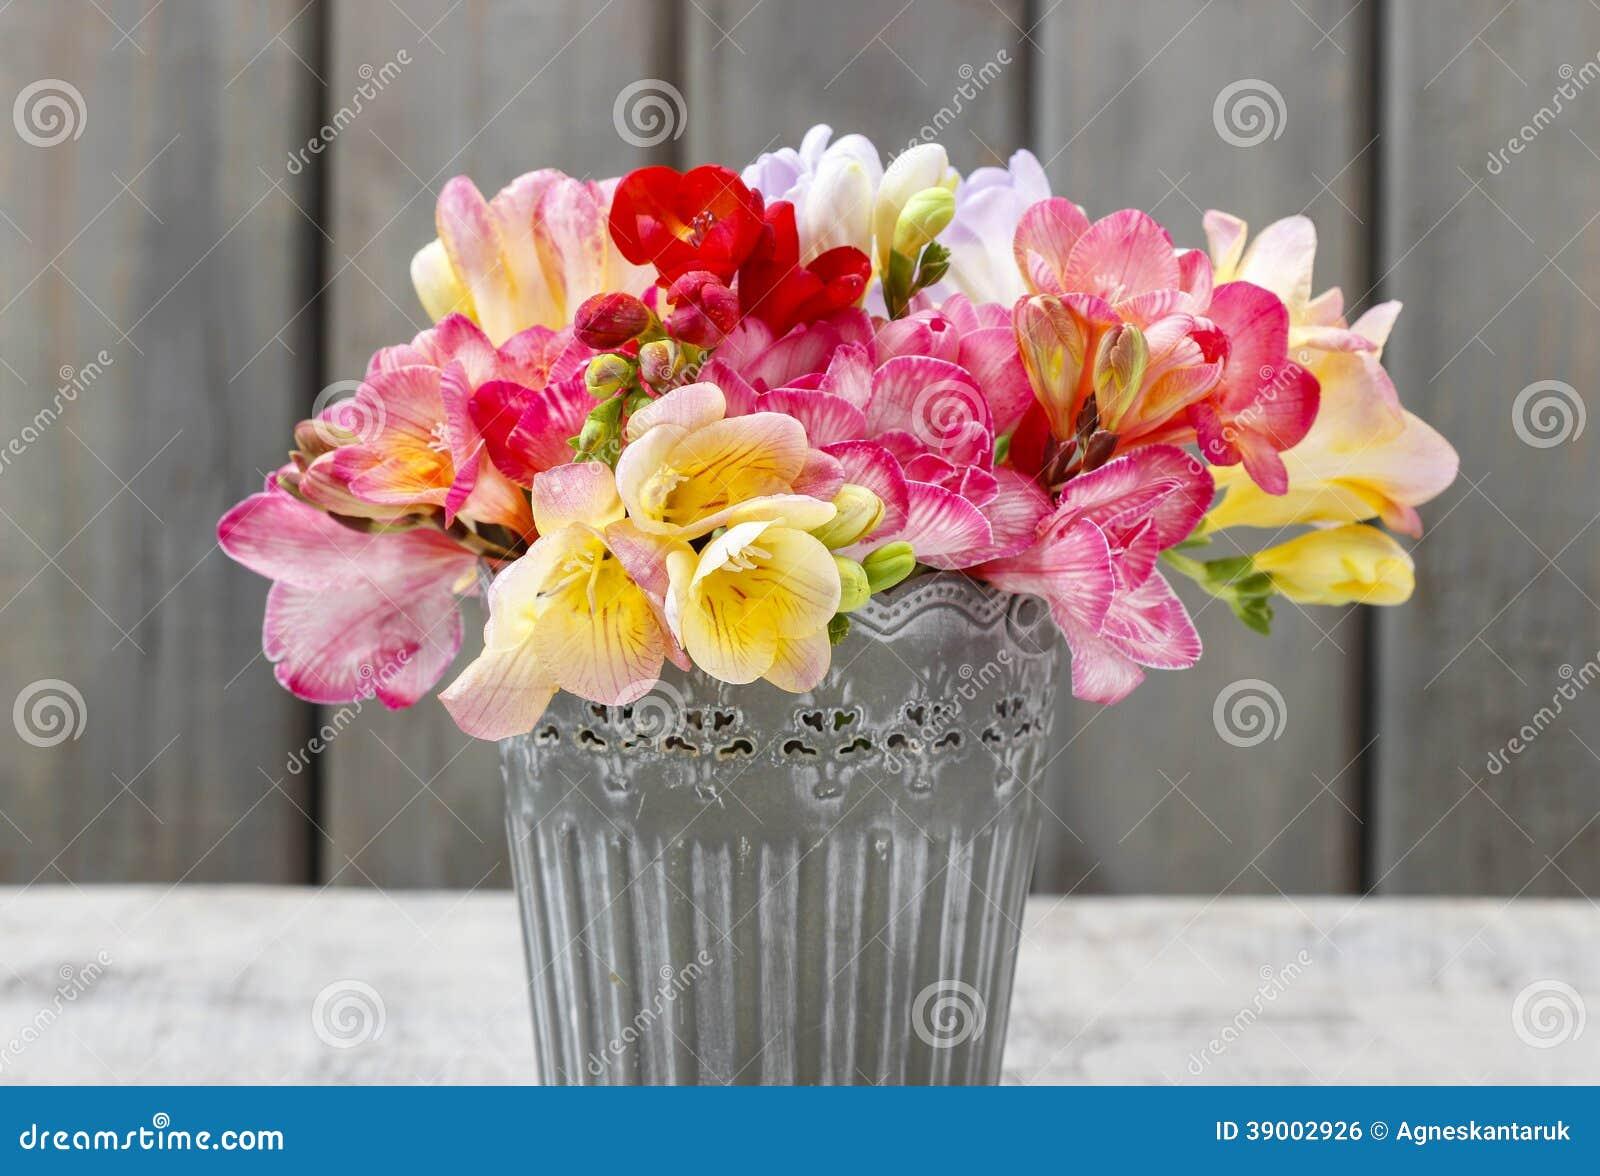 Bouquet of colorful freesia flowers stock photo image of birthday bouquet of colorful freesia flowers birthday ceremony izmirmasajfo Gallery